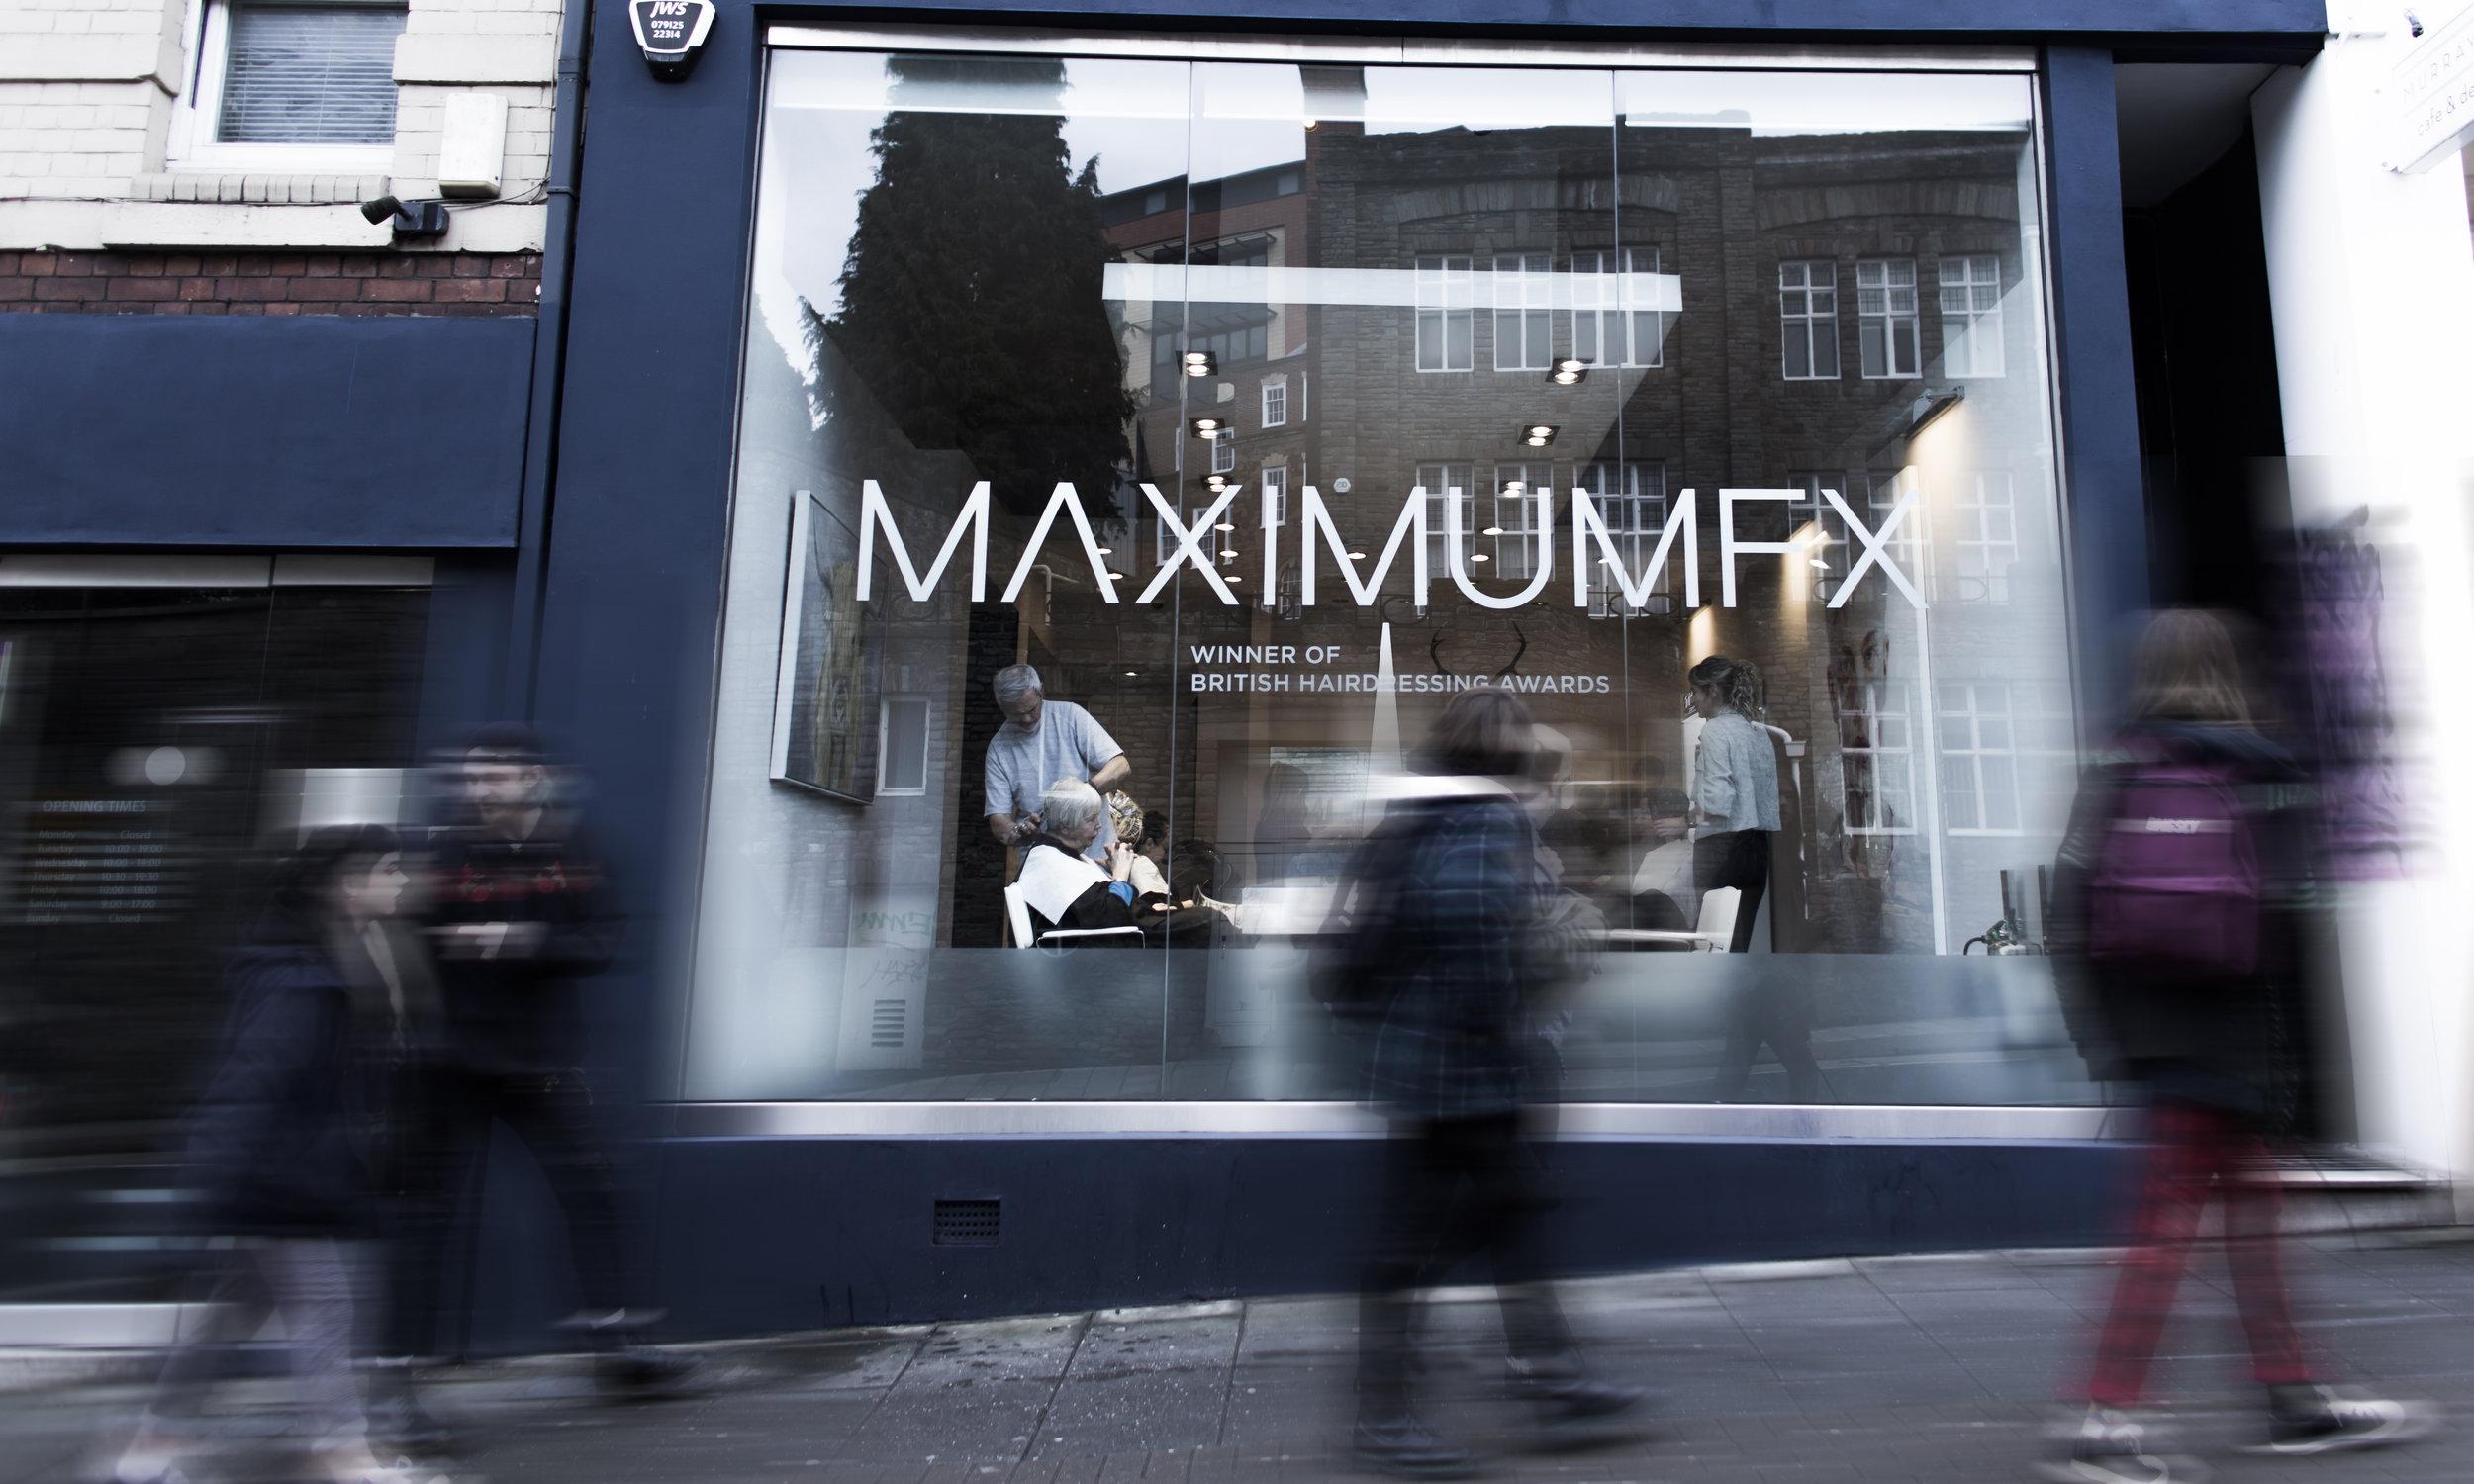 mfx-shop front.jpg